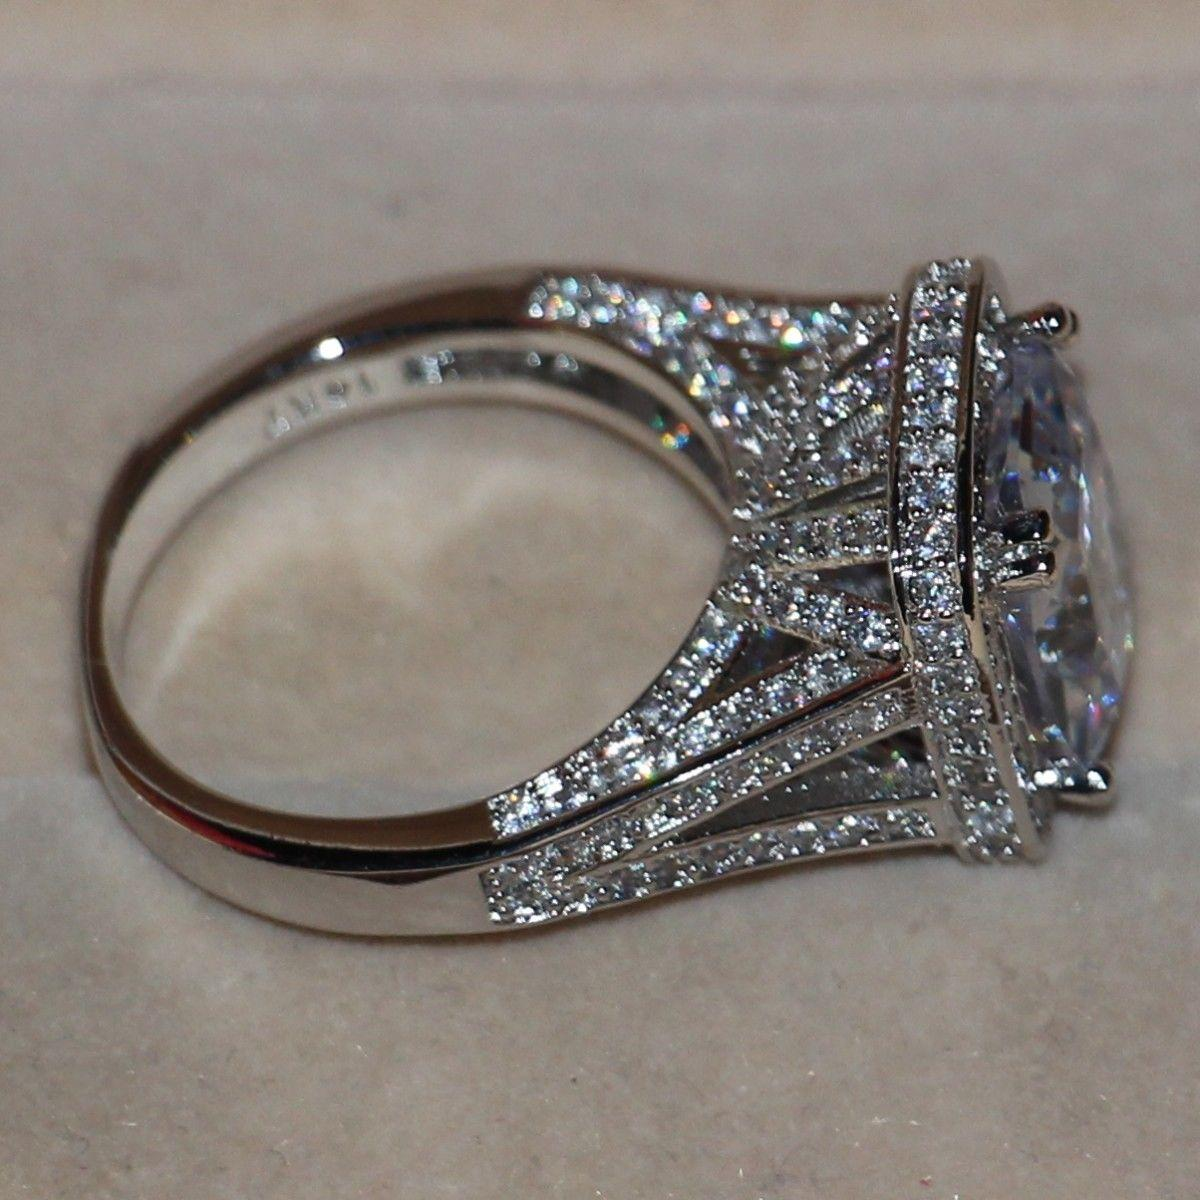 Tamaño 5-11 Joyería de Lujo 8CT Big Stone zafiro blanco 14kt oro blanco lleno GF Simulated Diamond Wedding Band Anillo de compromiso amantes regalo